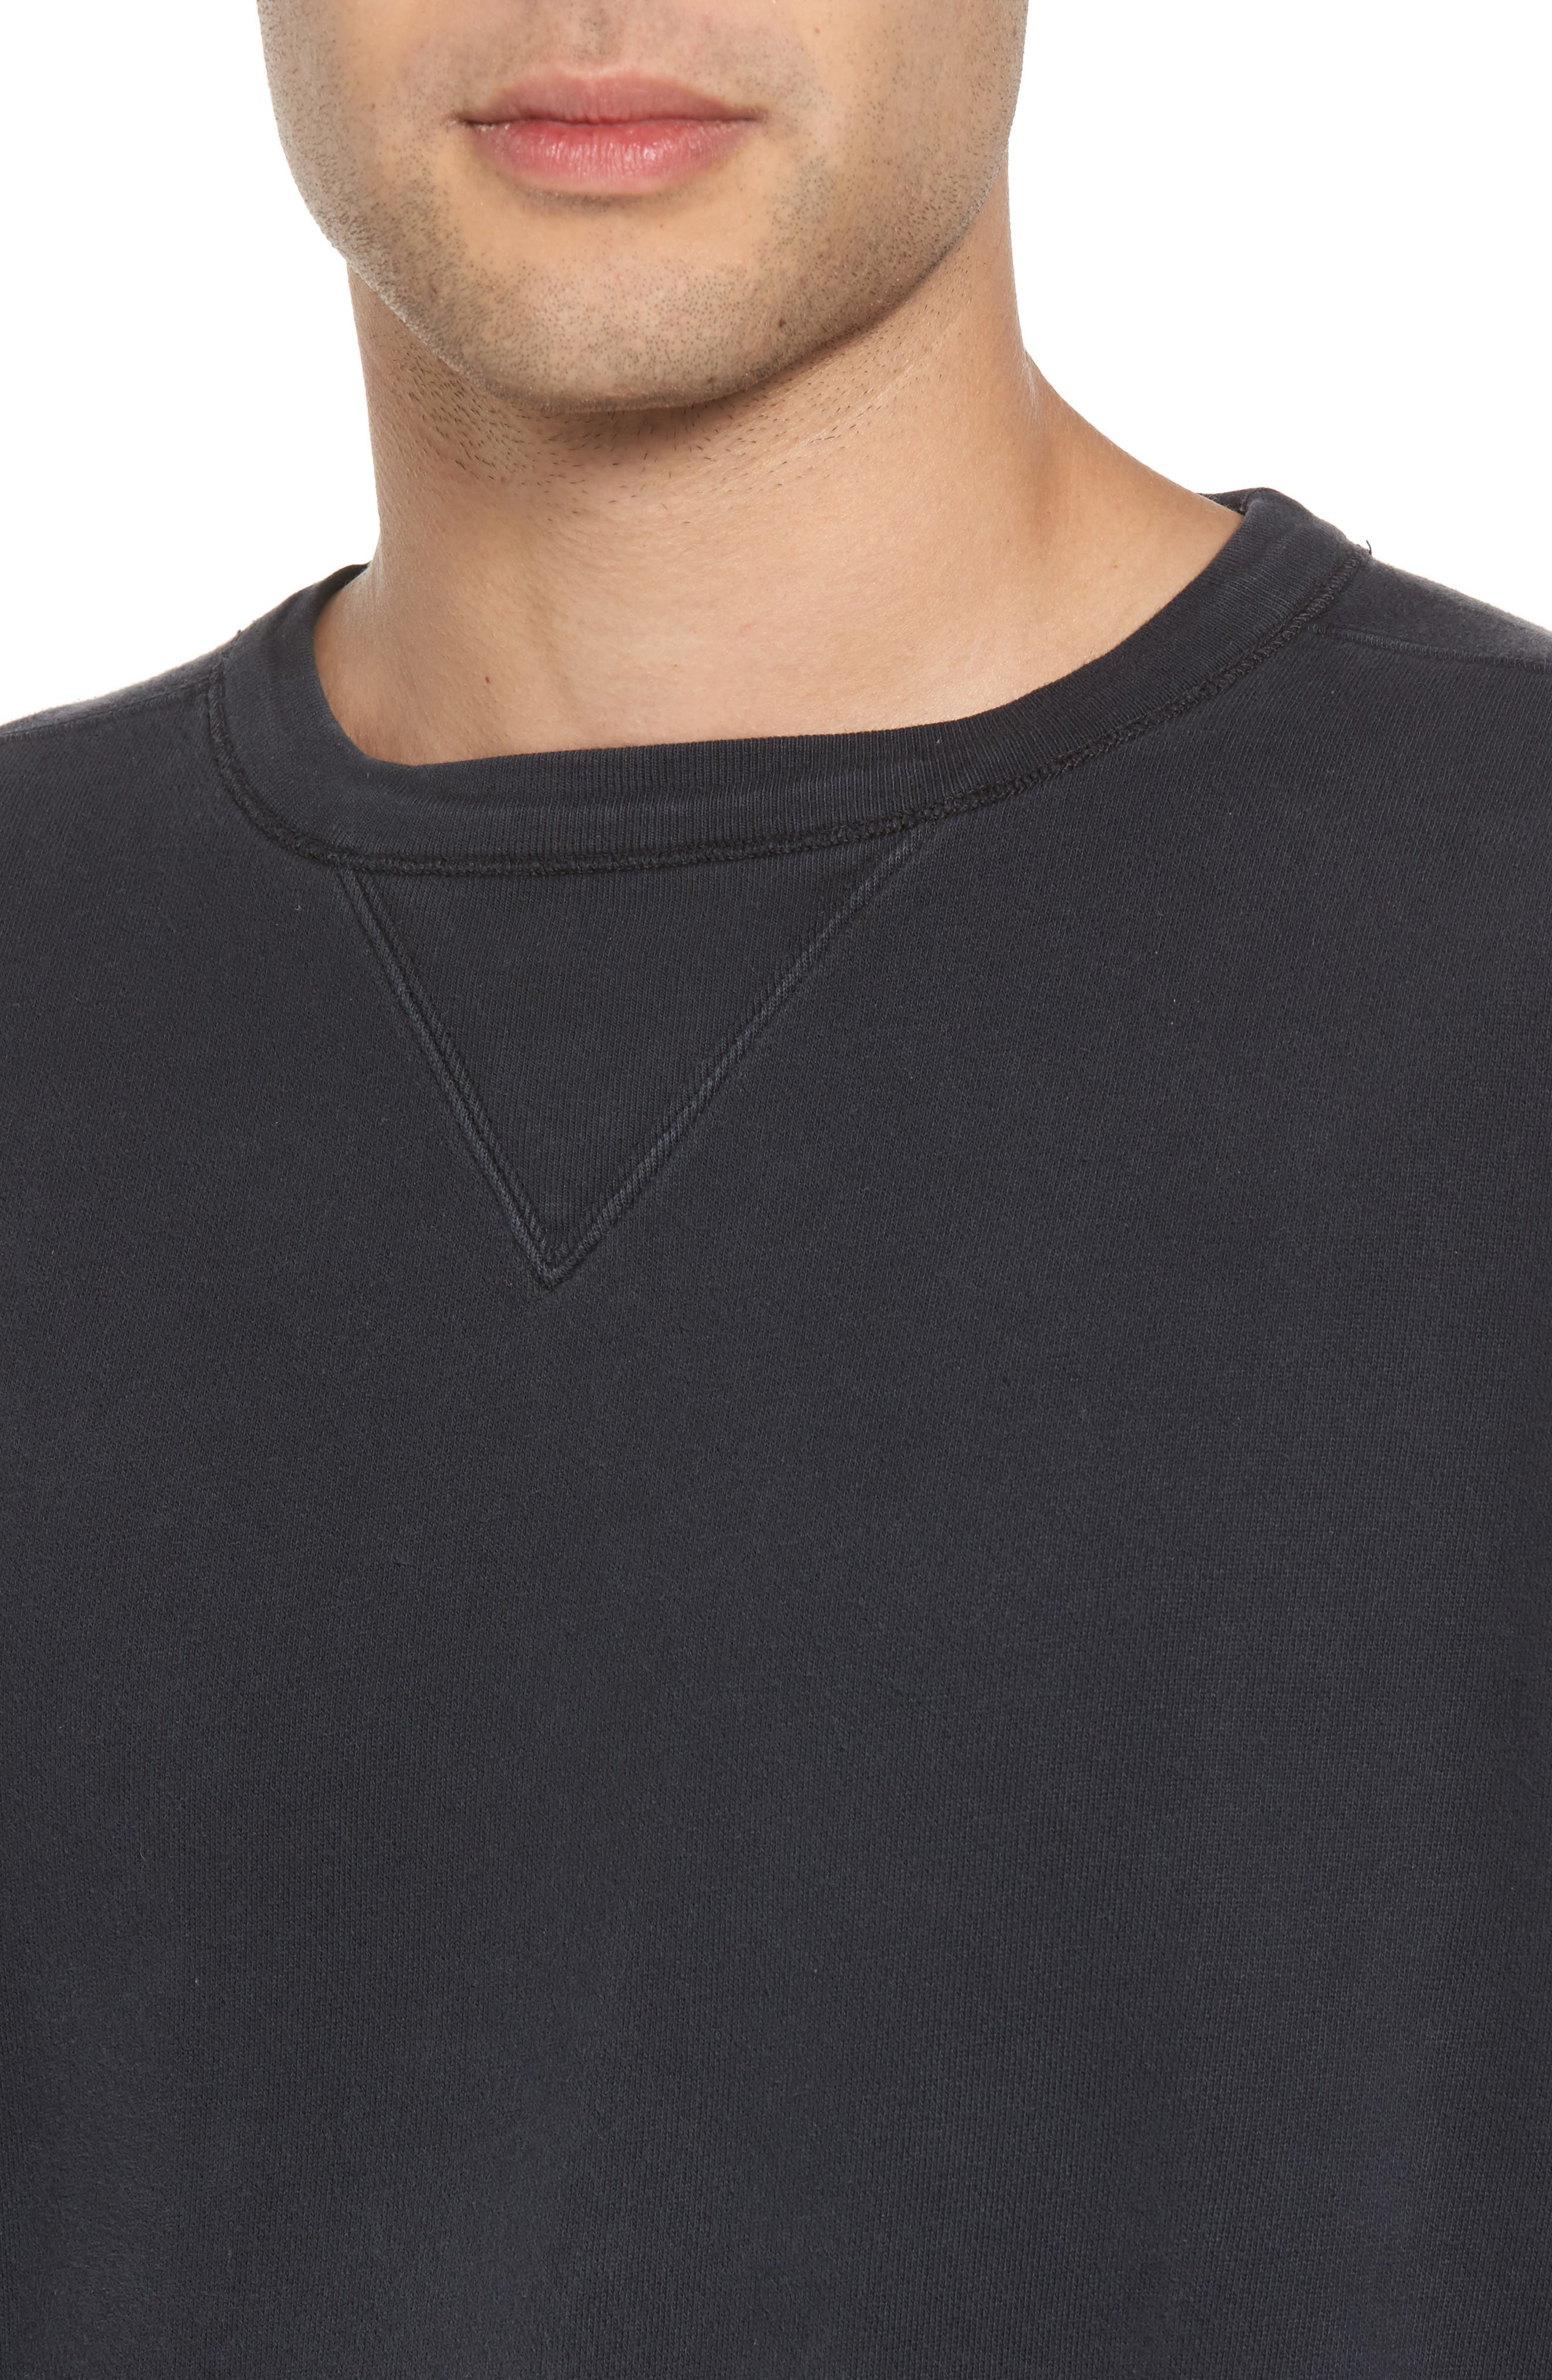 Bay Meadows Sweatshirt,                             Alternate thumbnail 4, color,                             BLACK